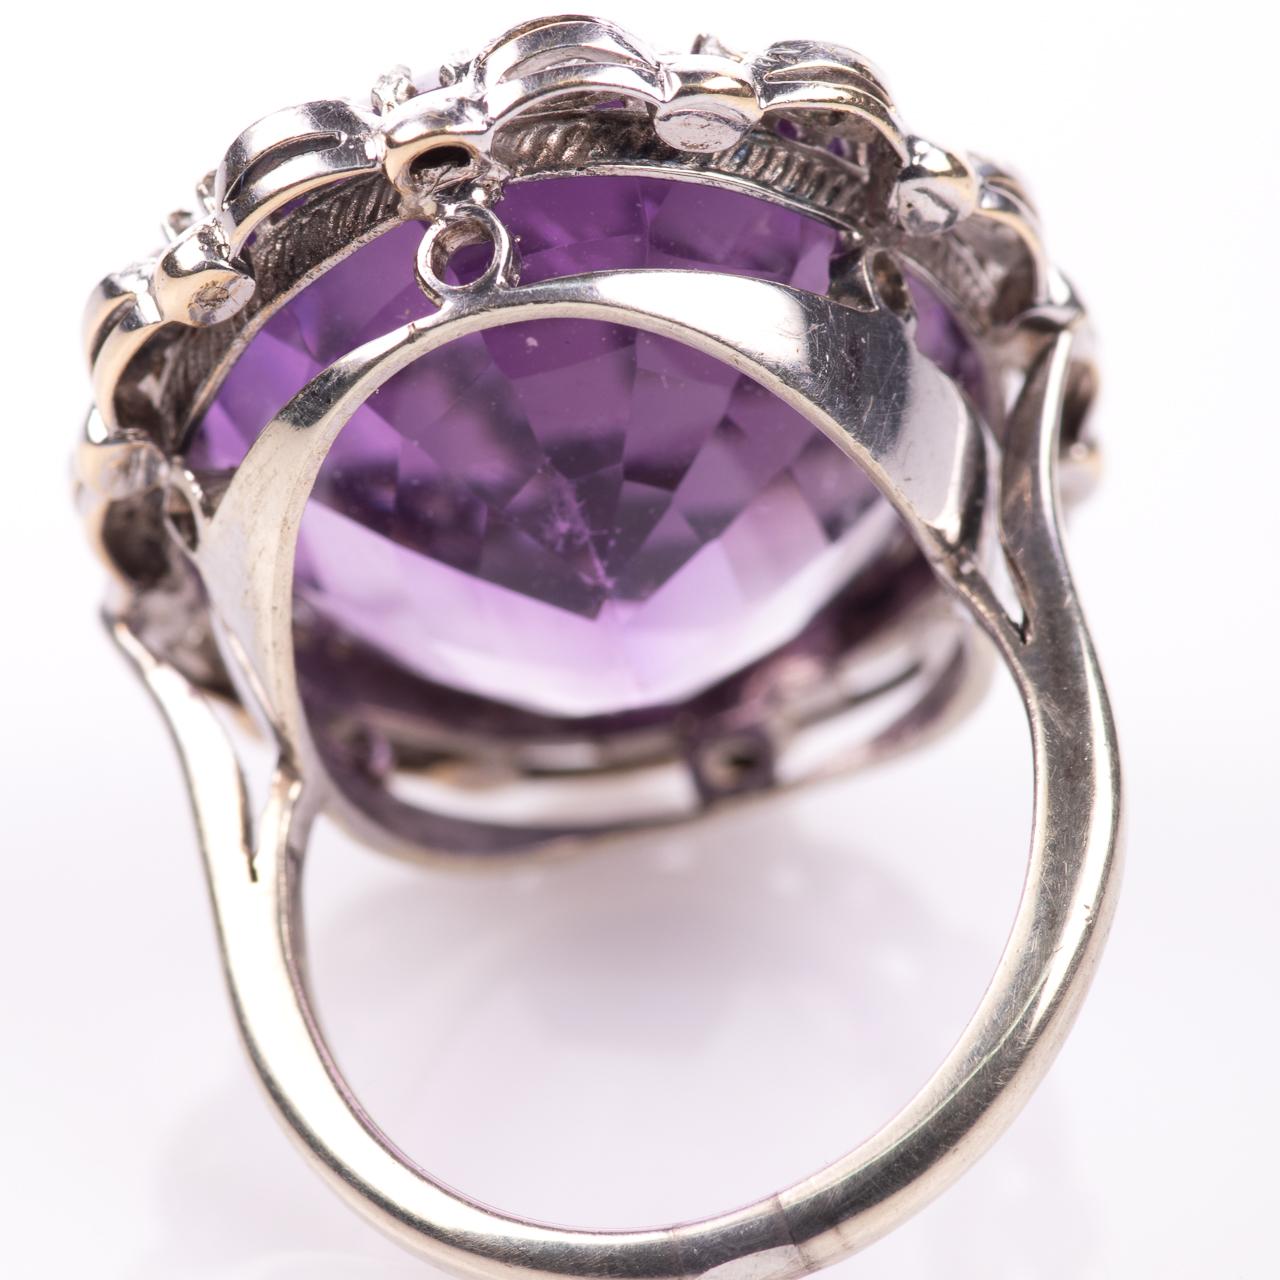 30ct Amethyst & Diamond Ring - Image 5 of 6